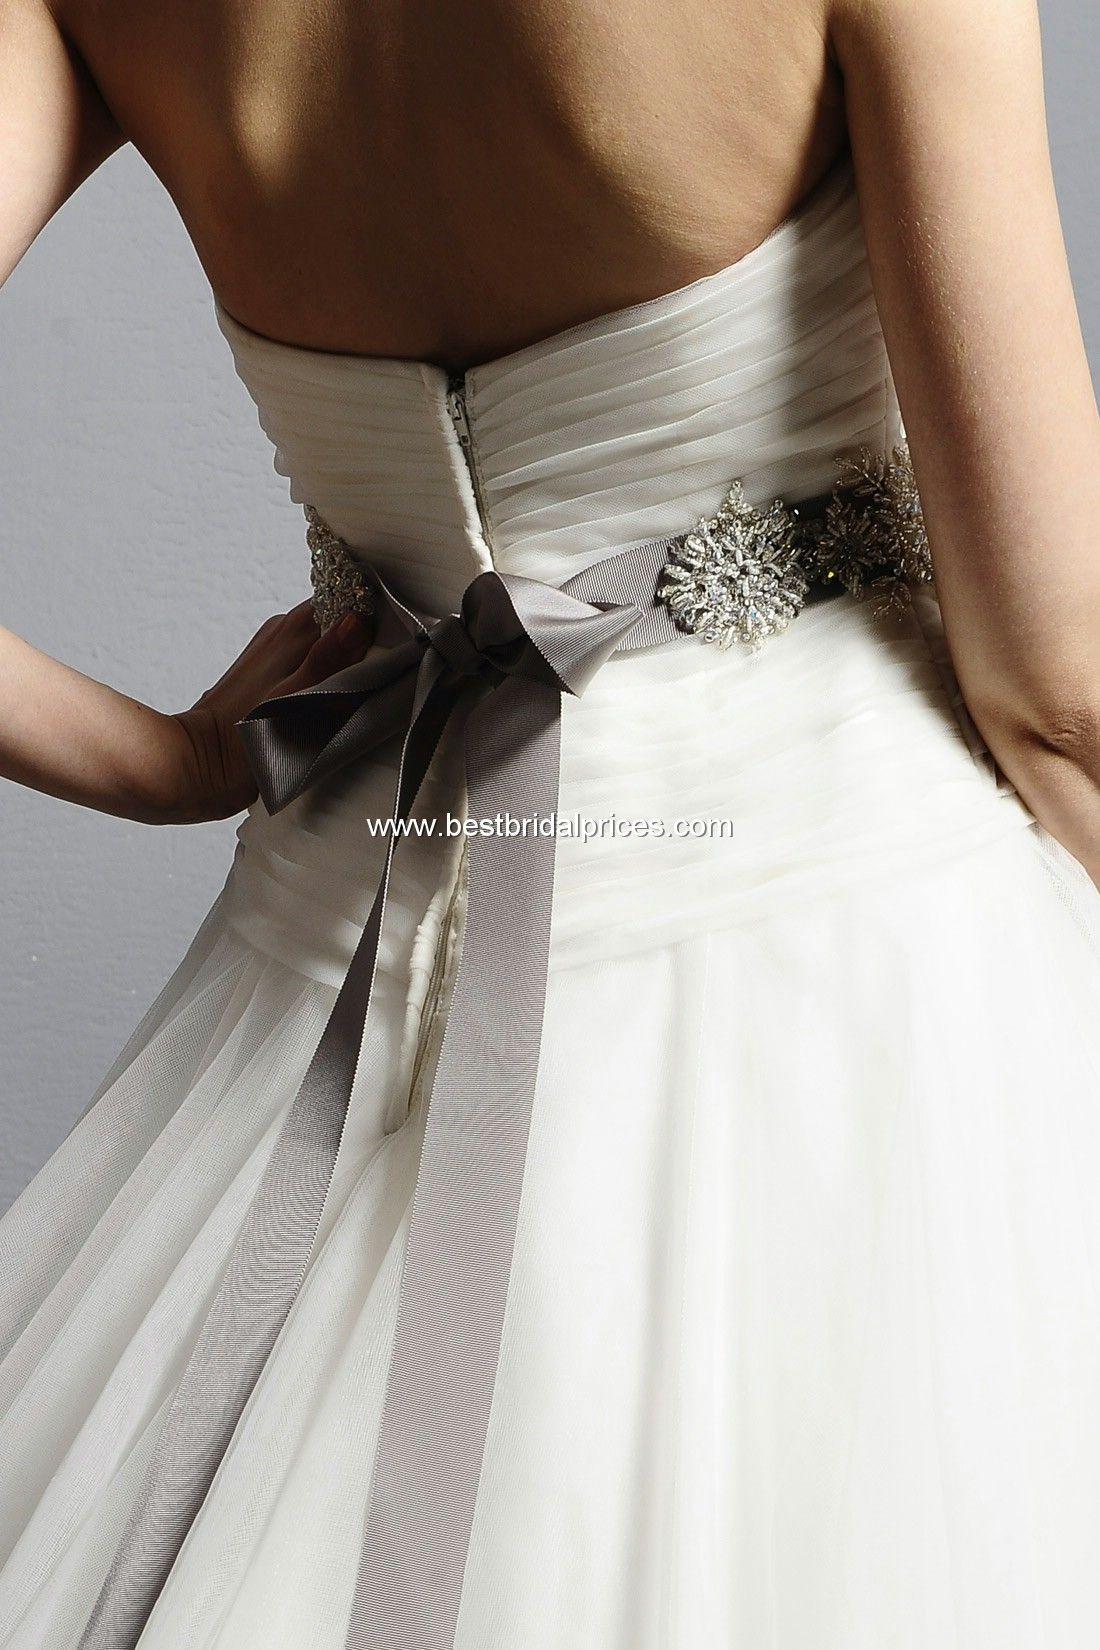 Platinum edition wedding dresses  love the platinum  Wedding Dresses  Pinterest  Wedding dress